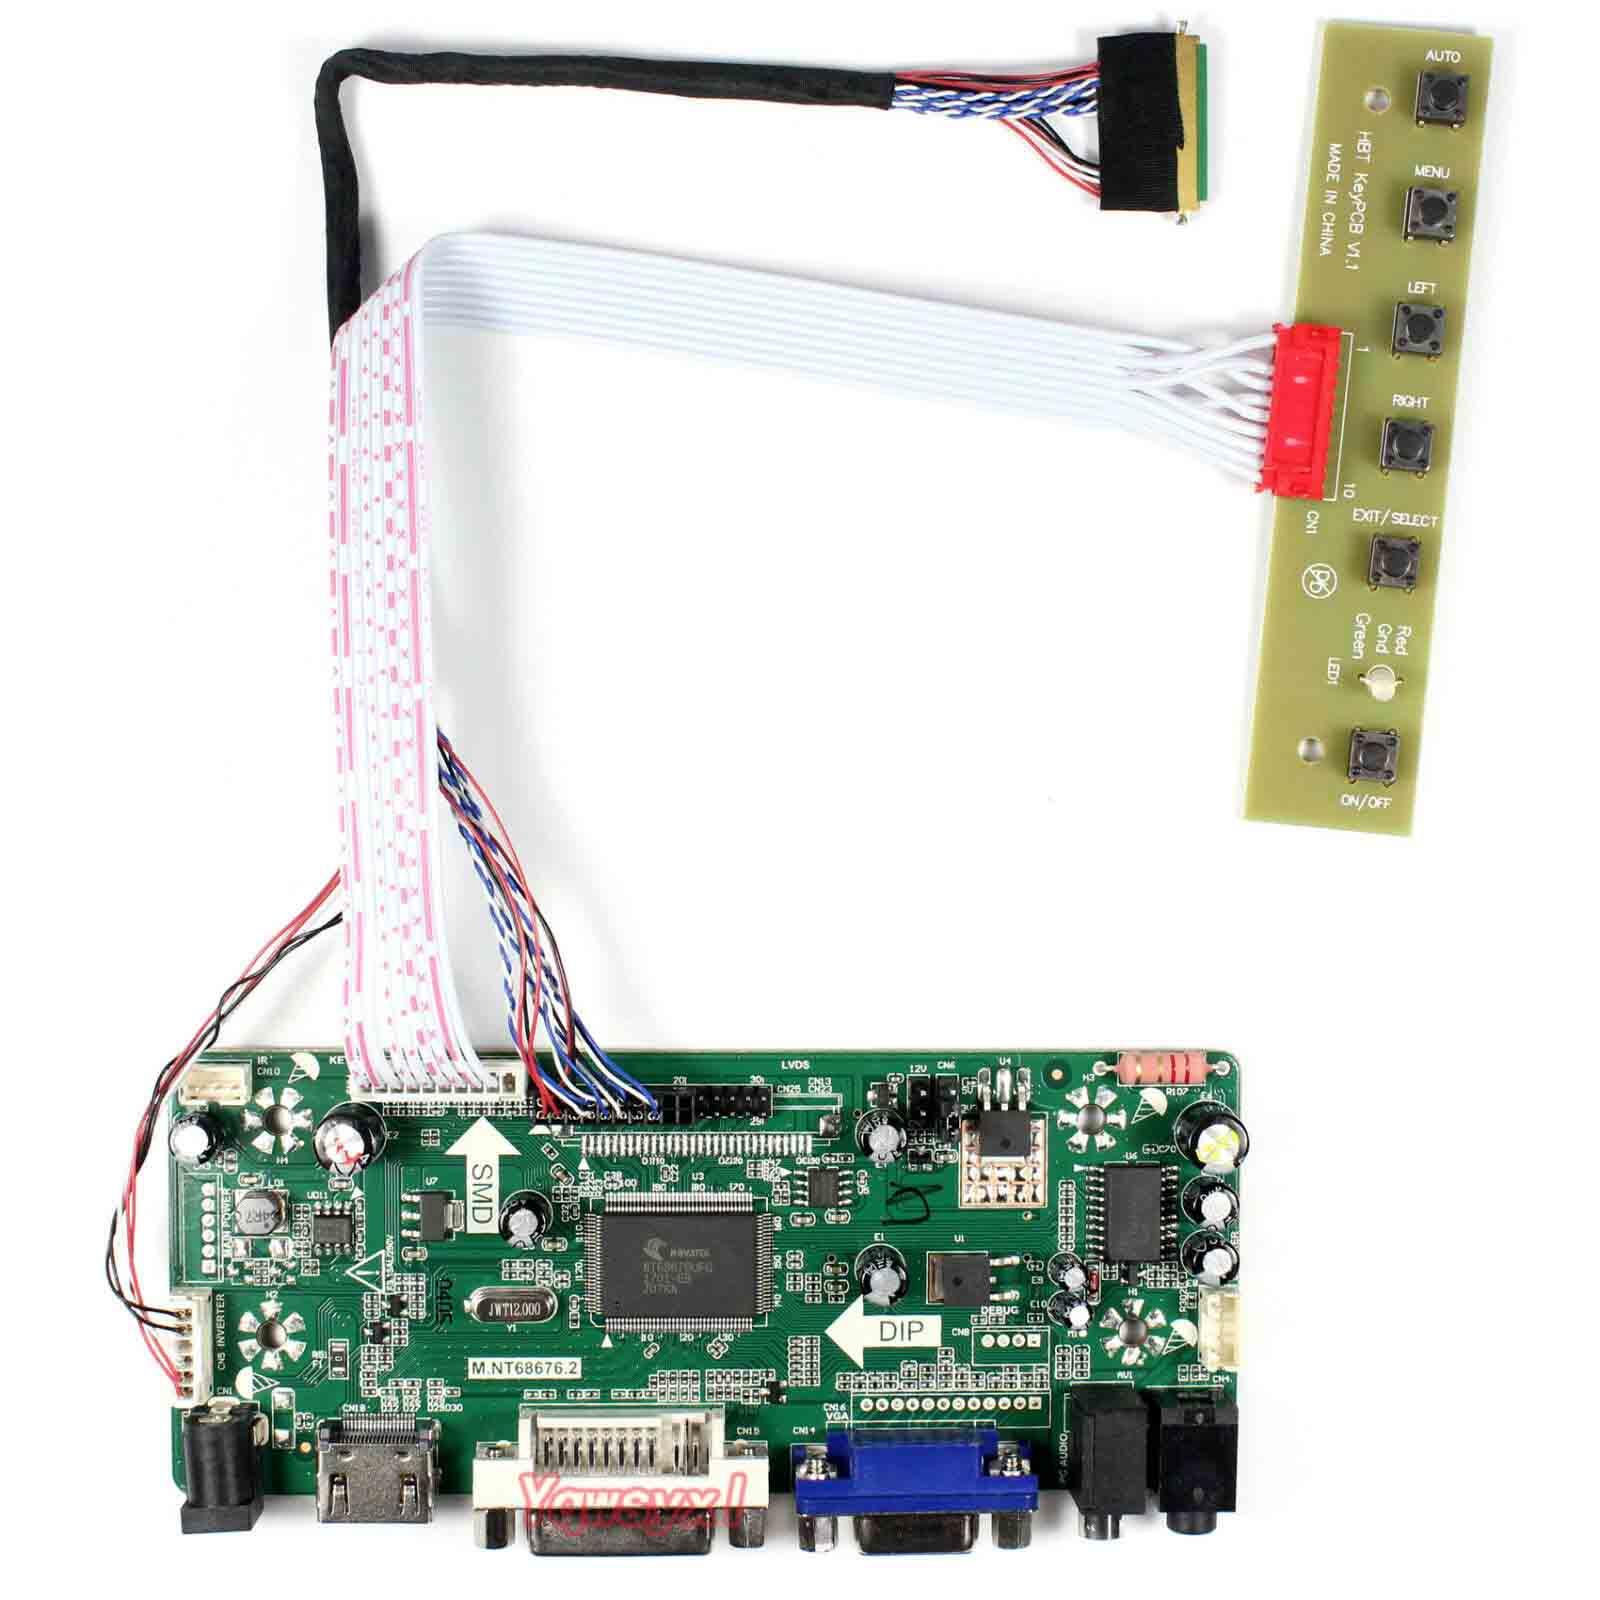 Yqwsyxl Control Board Monitor Kit For B156XTN02.2 B156XTN02.1 HDMI+DVI+VGA LCD LED  Screen Controller Board Driver